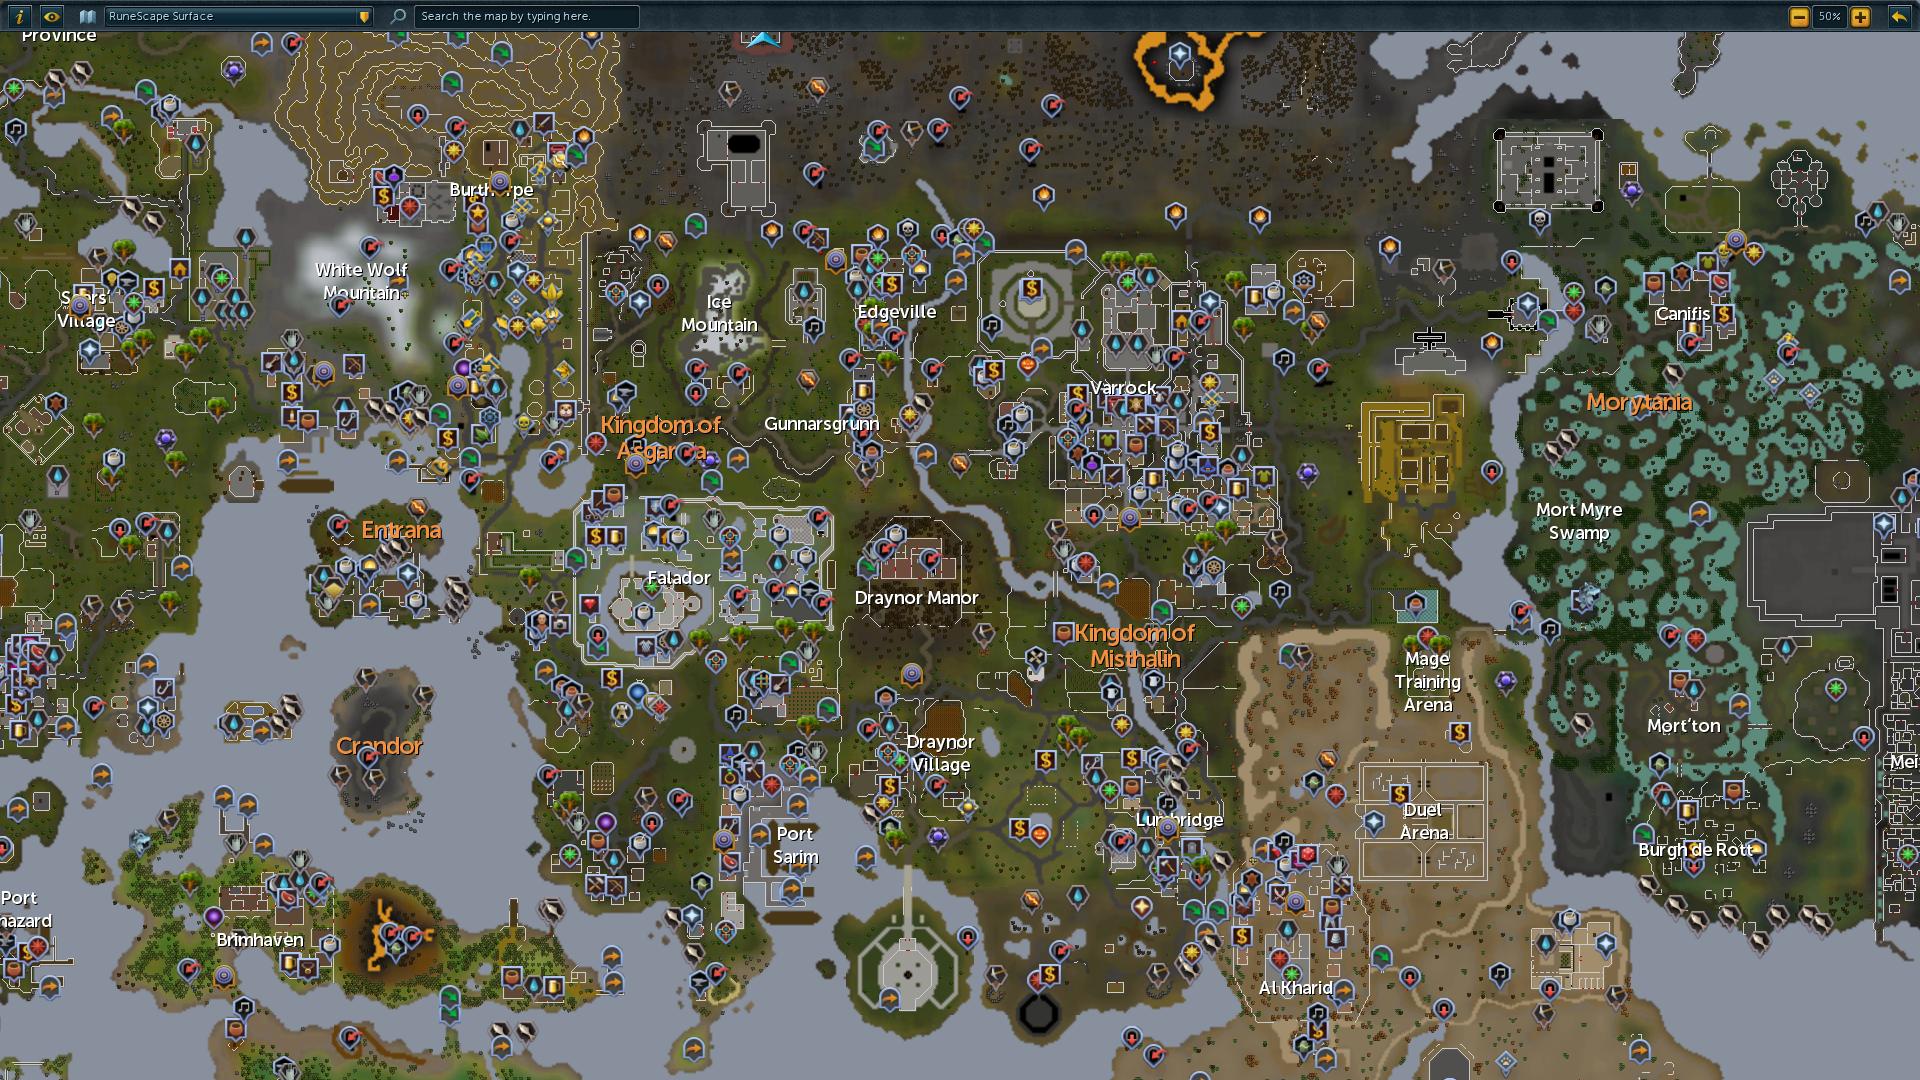 World map | RuneScape Wiki | FANDOM powered by Wikia